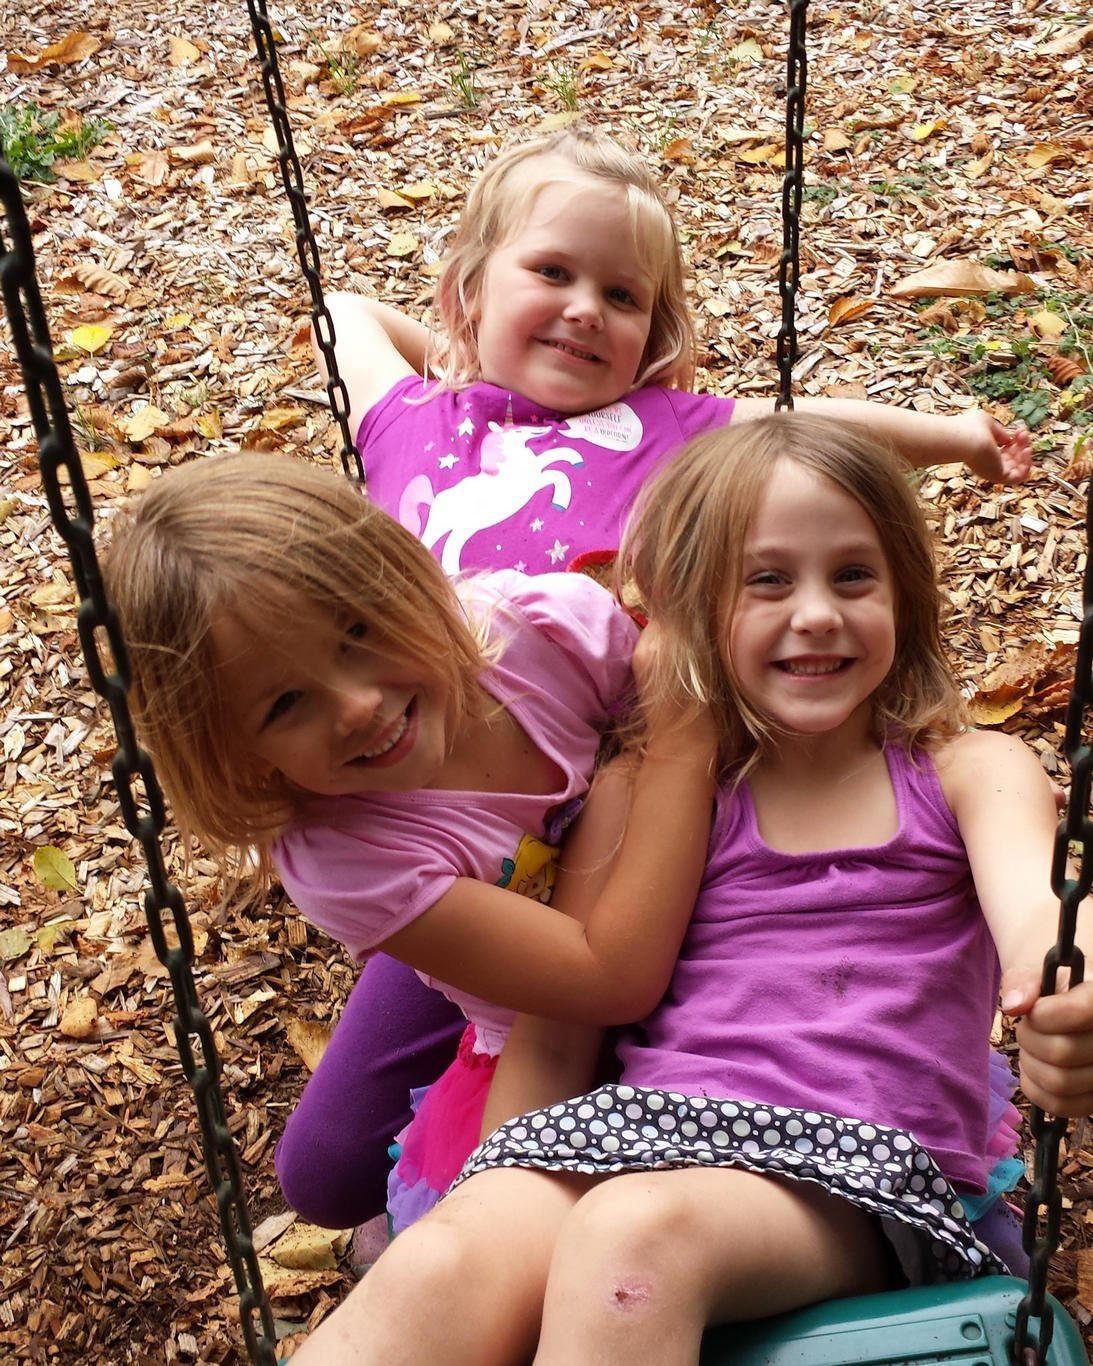 Girls share a swing in the preschool program at Village Learning